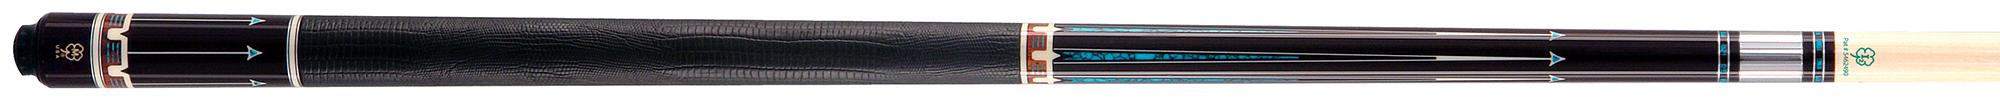 CK0974: McDermott CRM902 Black urethane/inlay carom #1